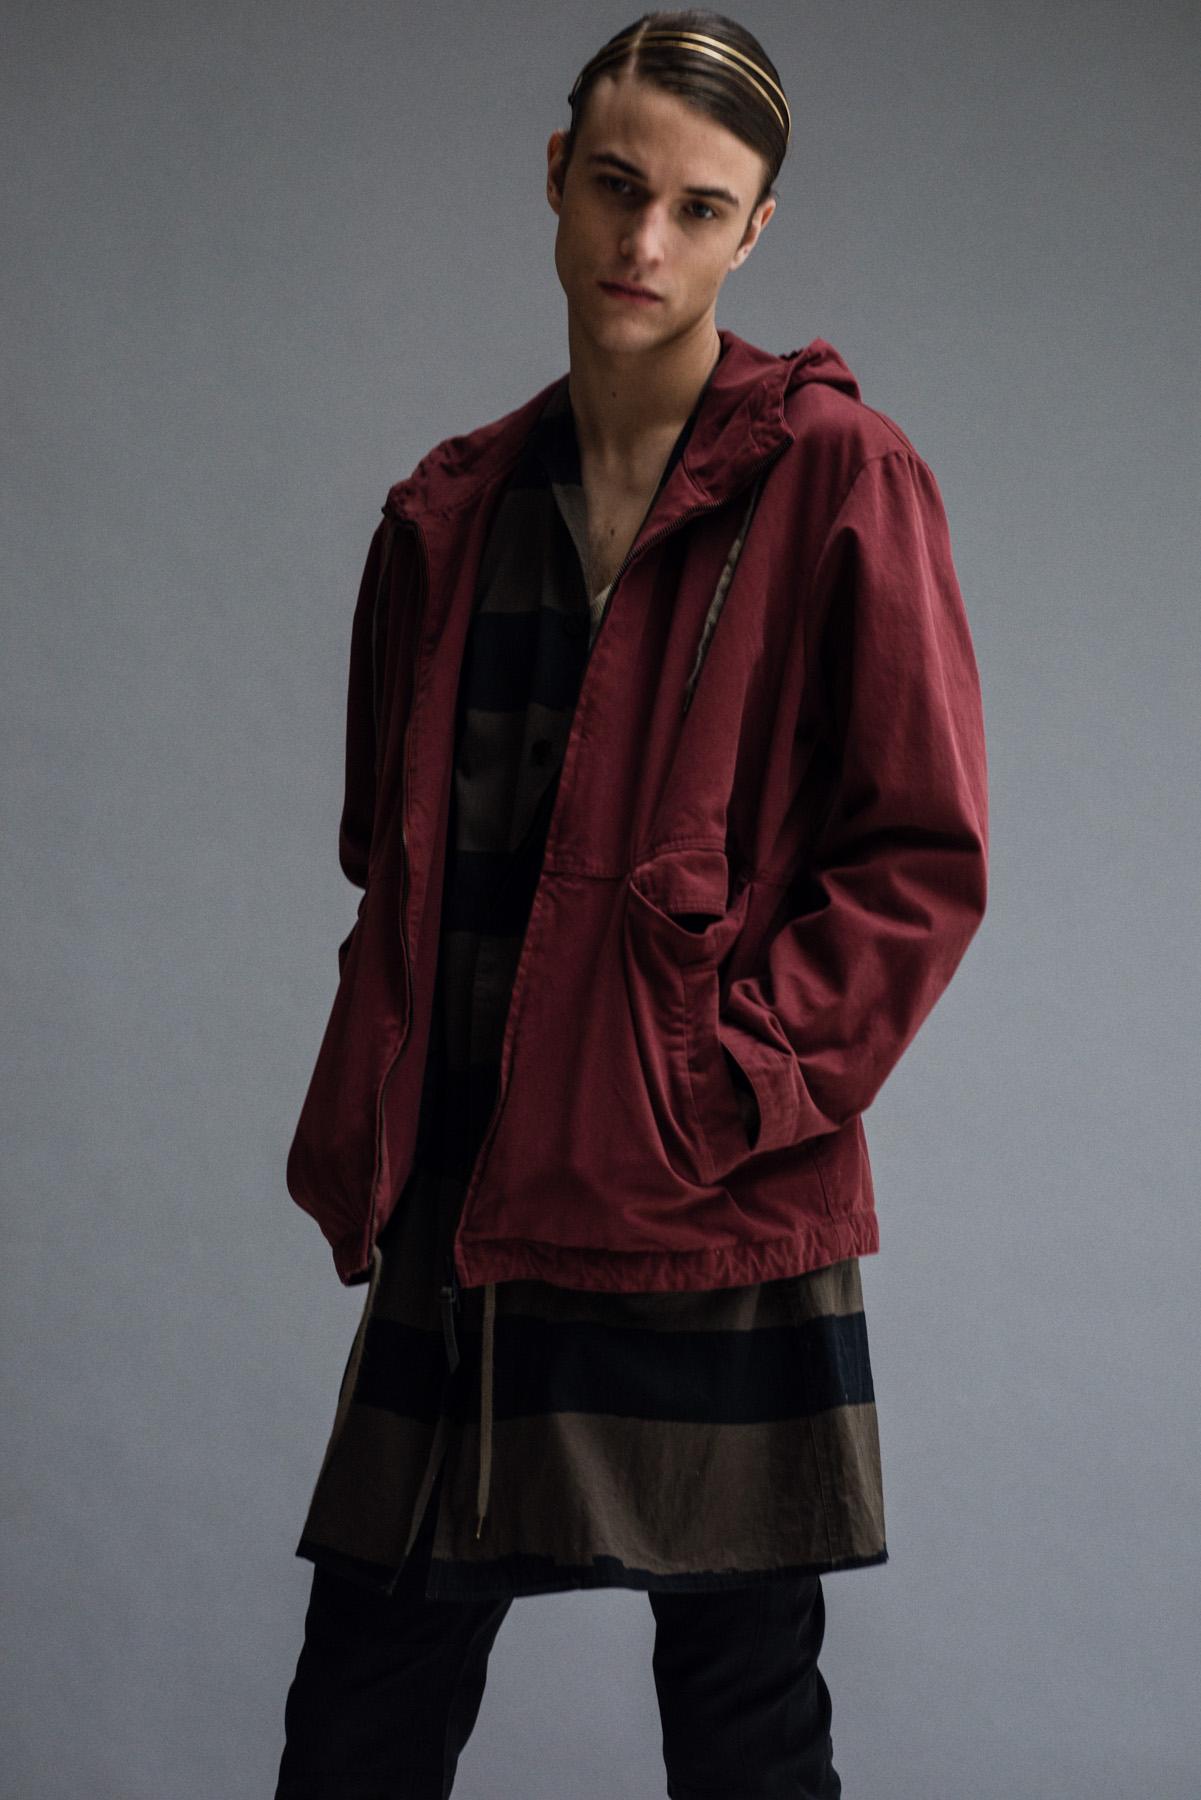 Leather jacket decade - A Decade Of Robert Geller